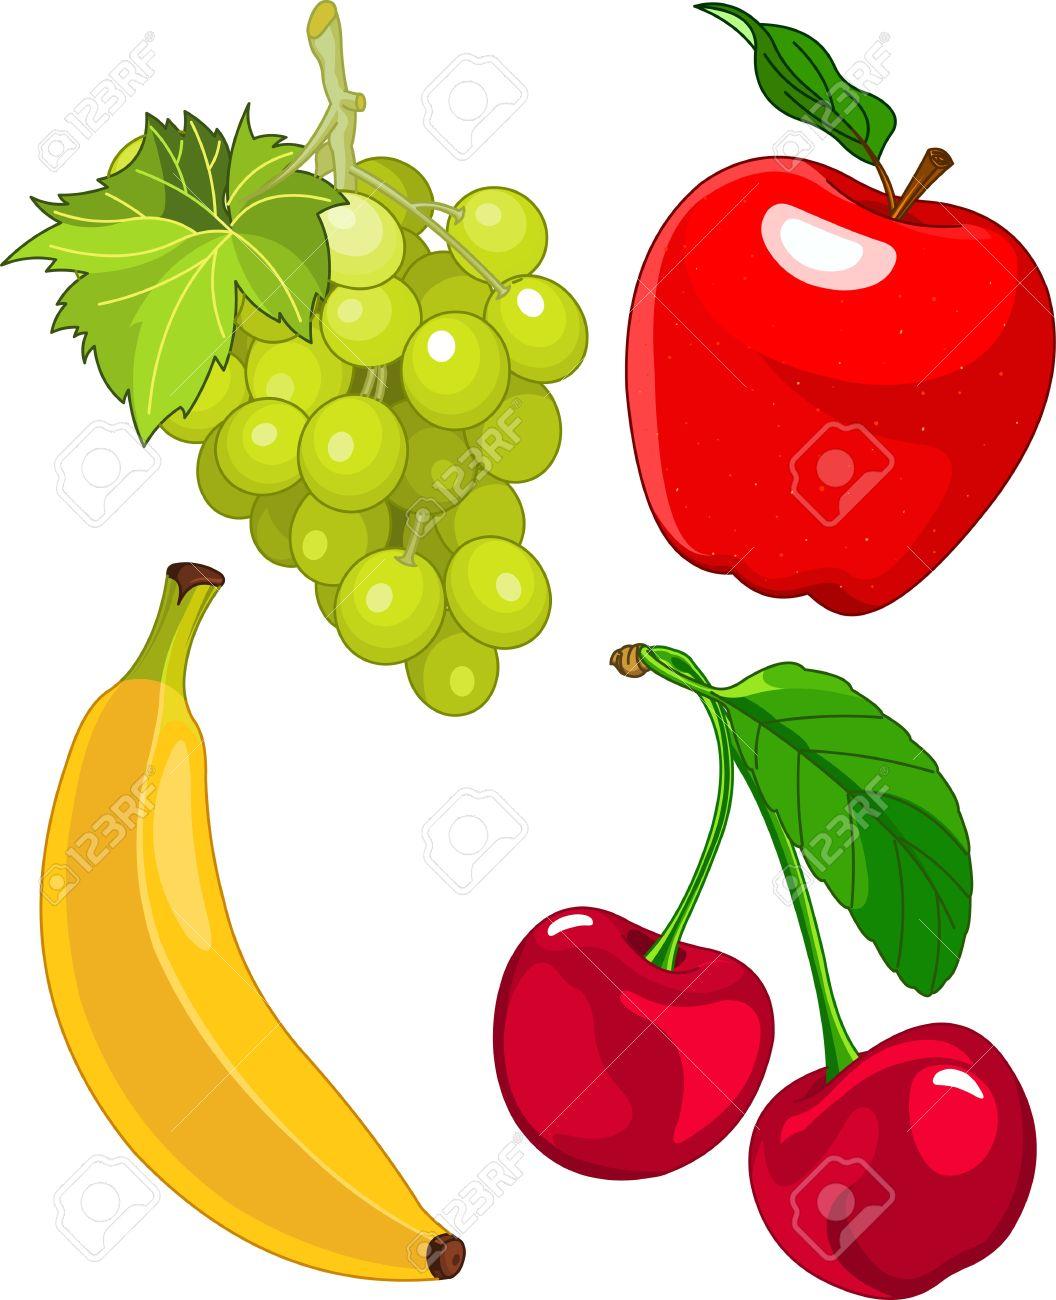 Cartoon fruit set, include banana, grape, apple and cherry - 14115157